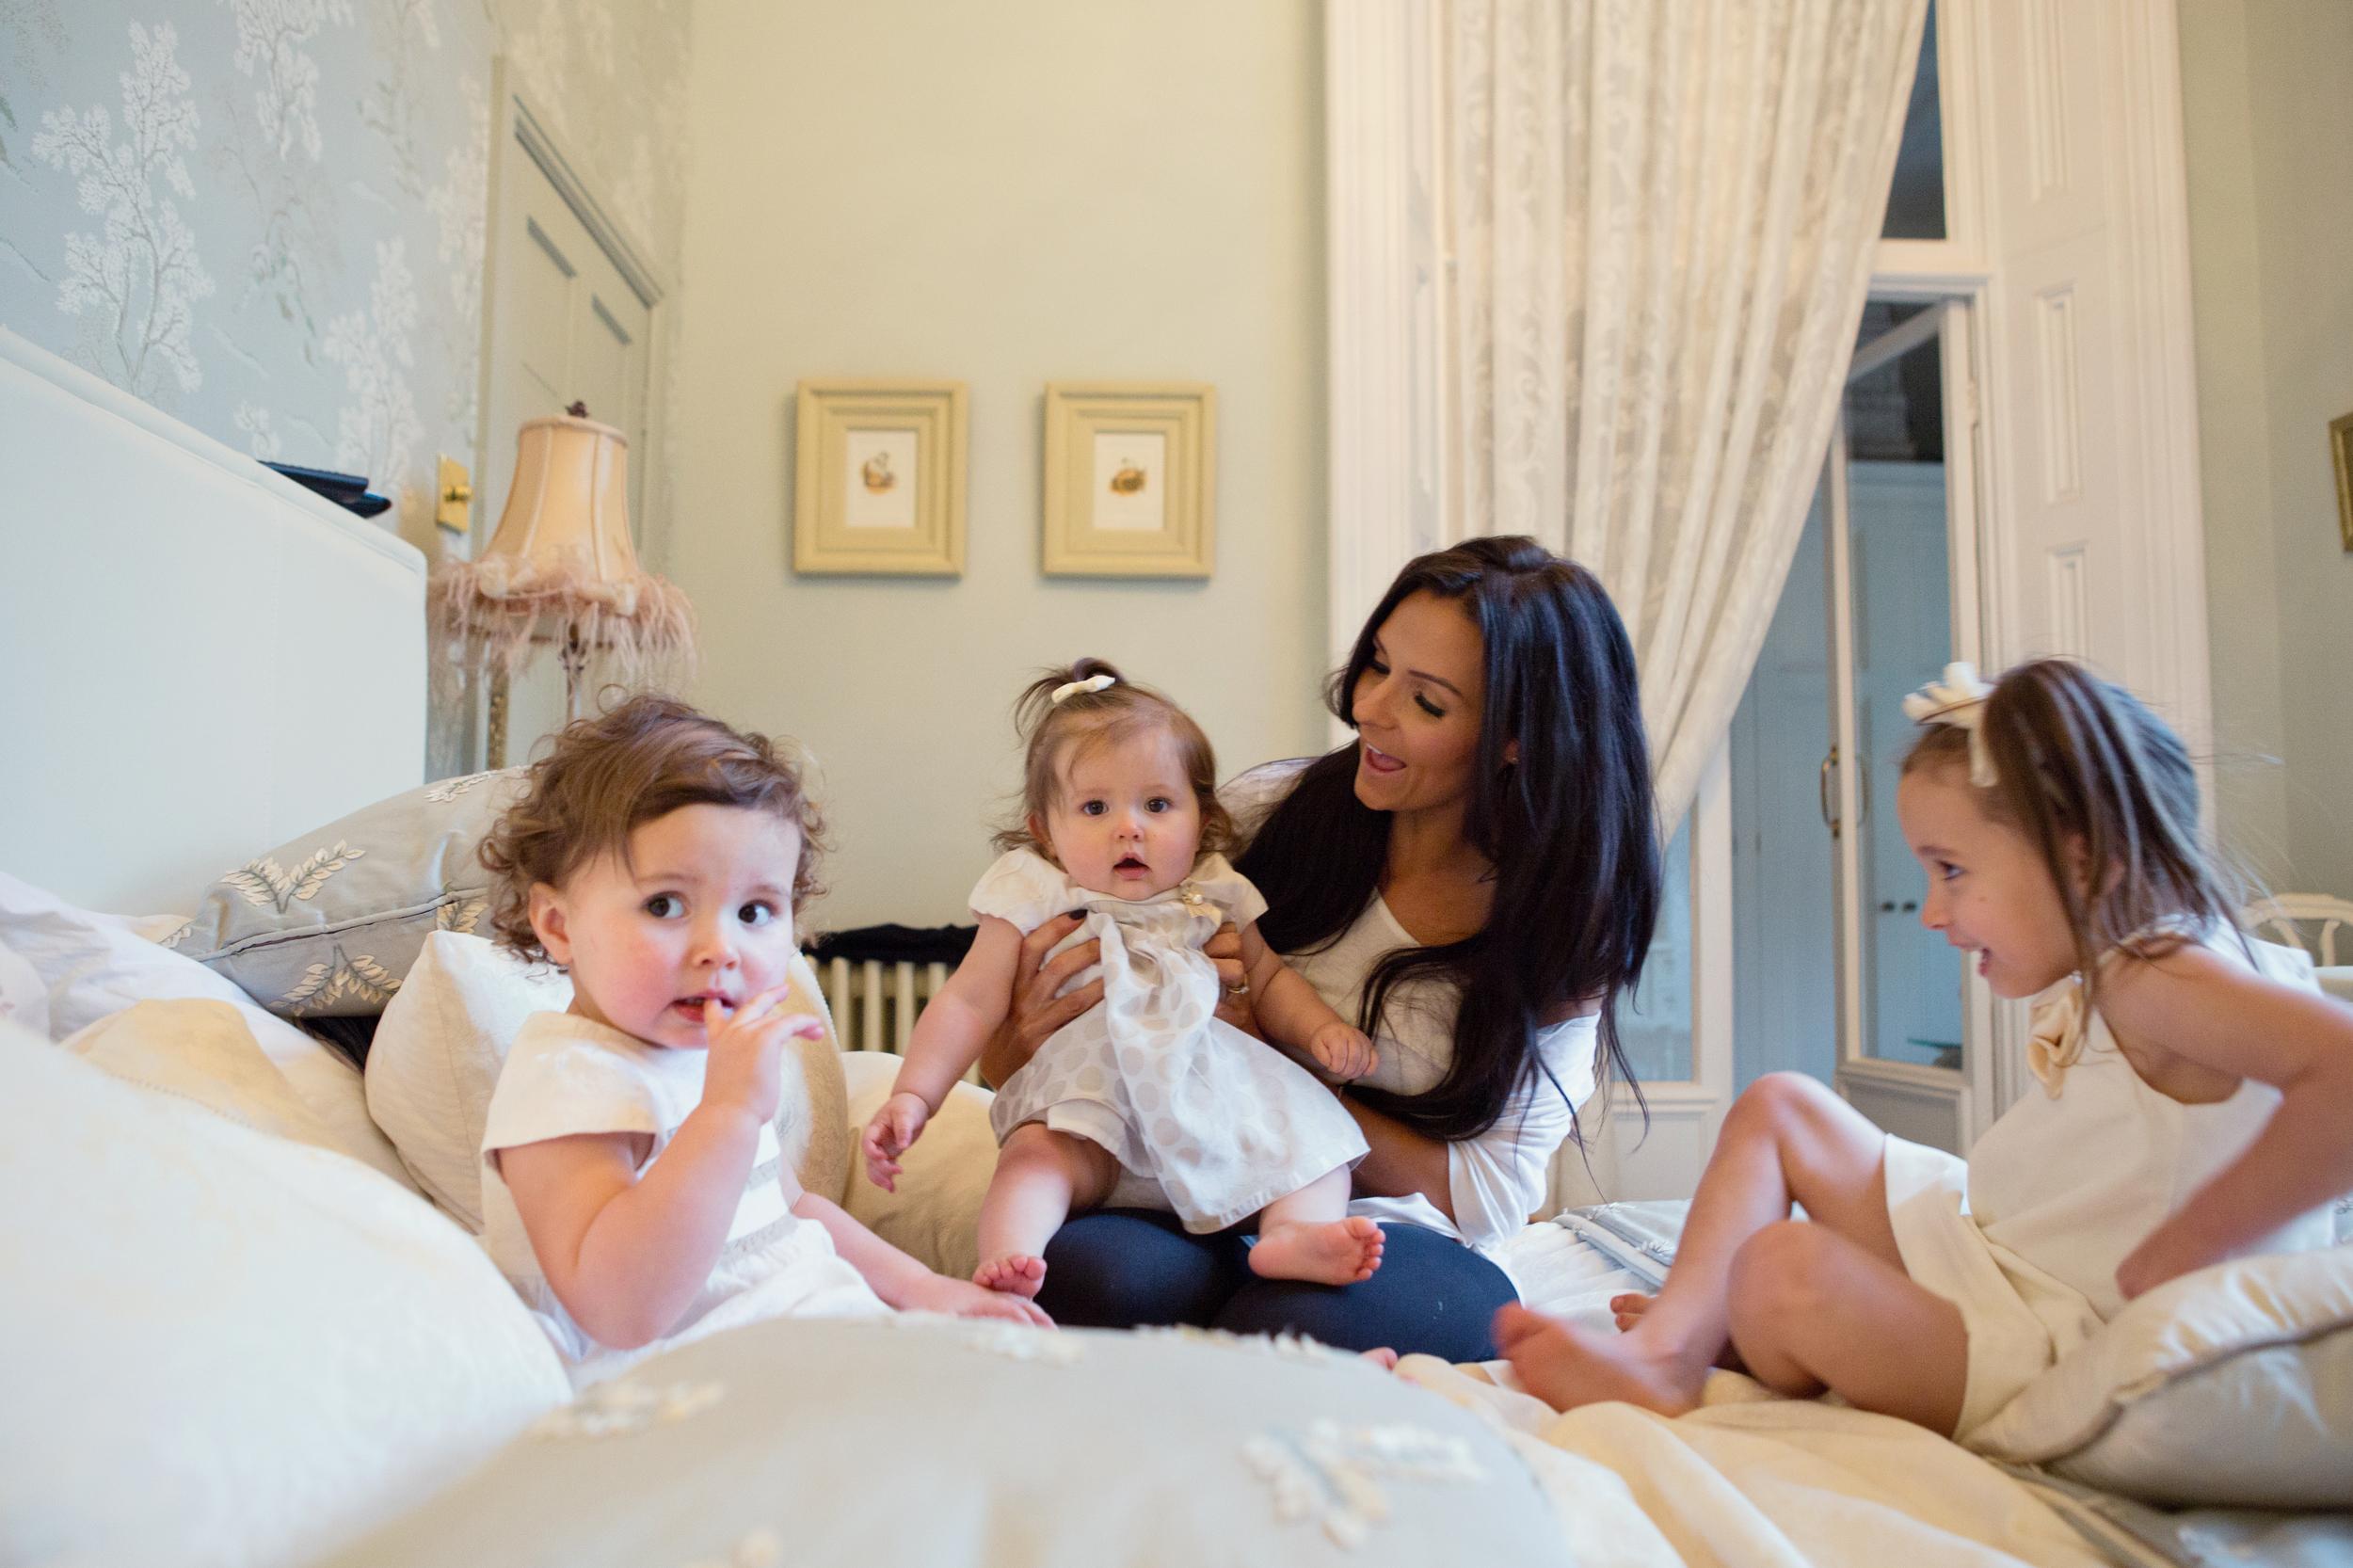 Sophie Evans Photography, At home Family Shoot, Warwickshire, West Midlands, Vicky, Meelia, Amiya & Kiki (3).jpg